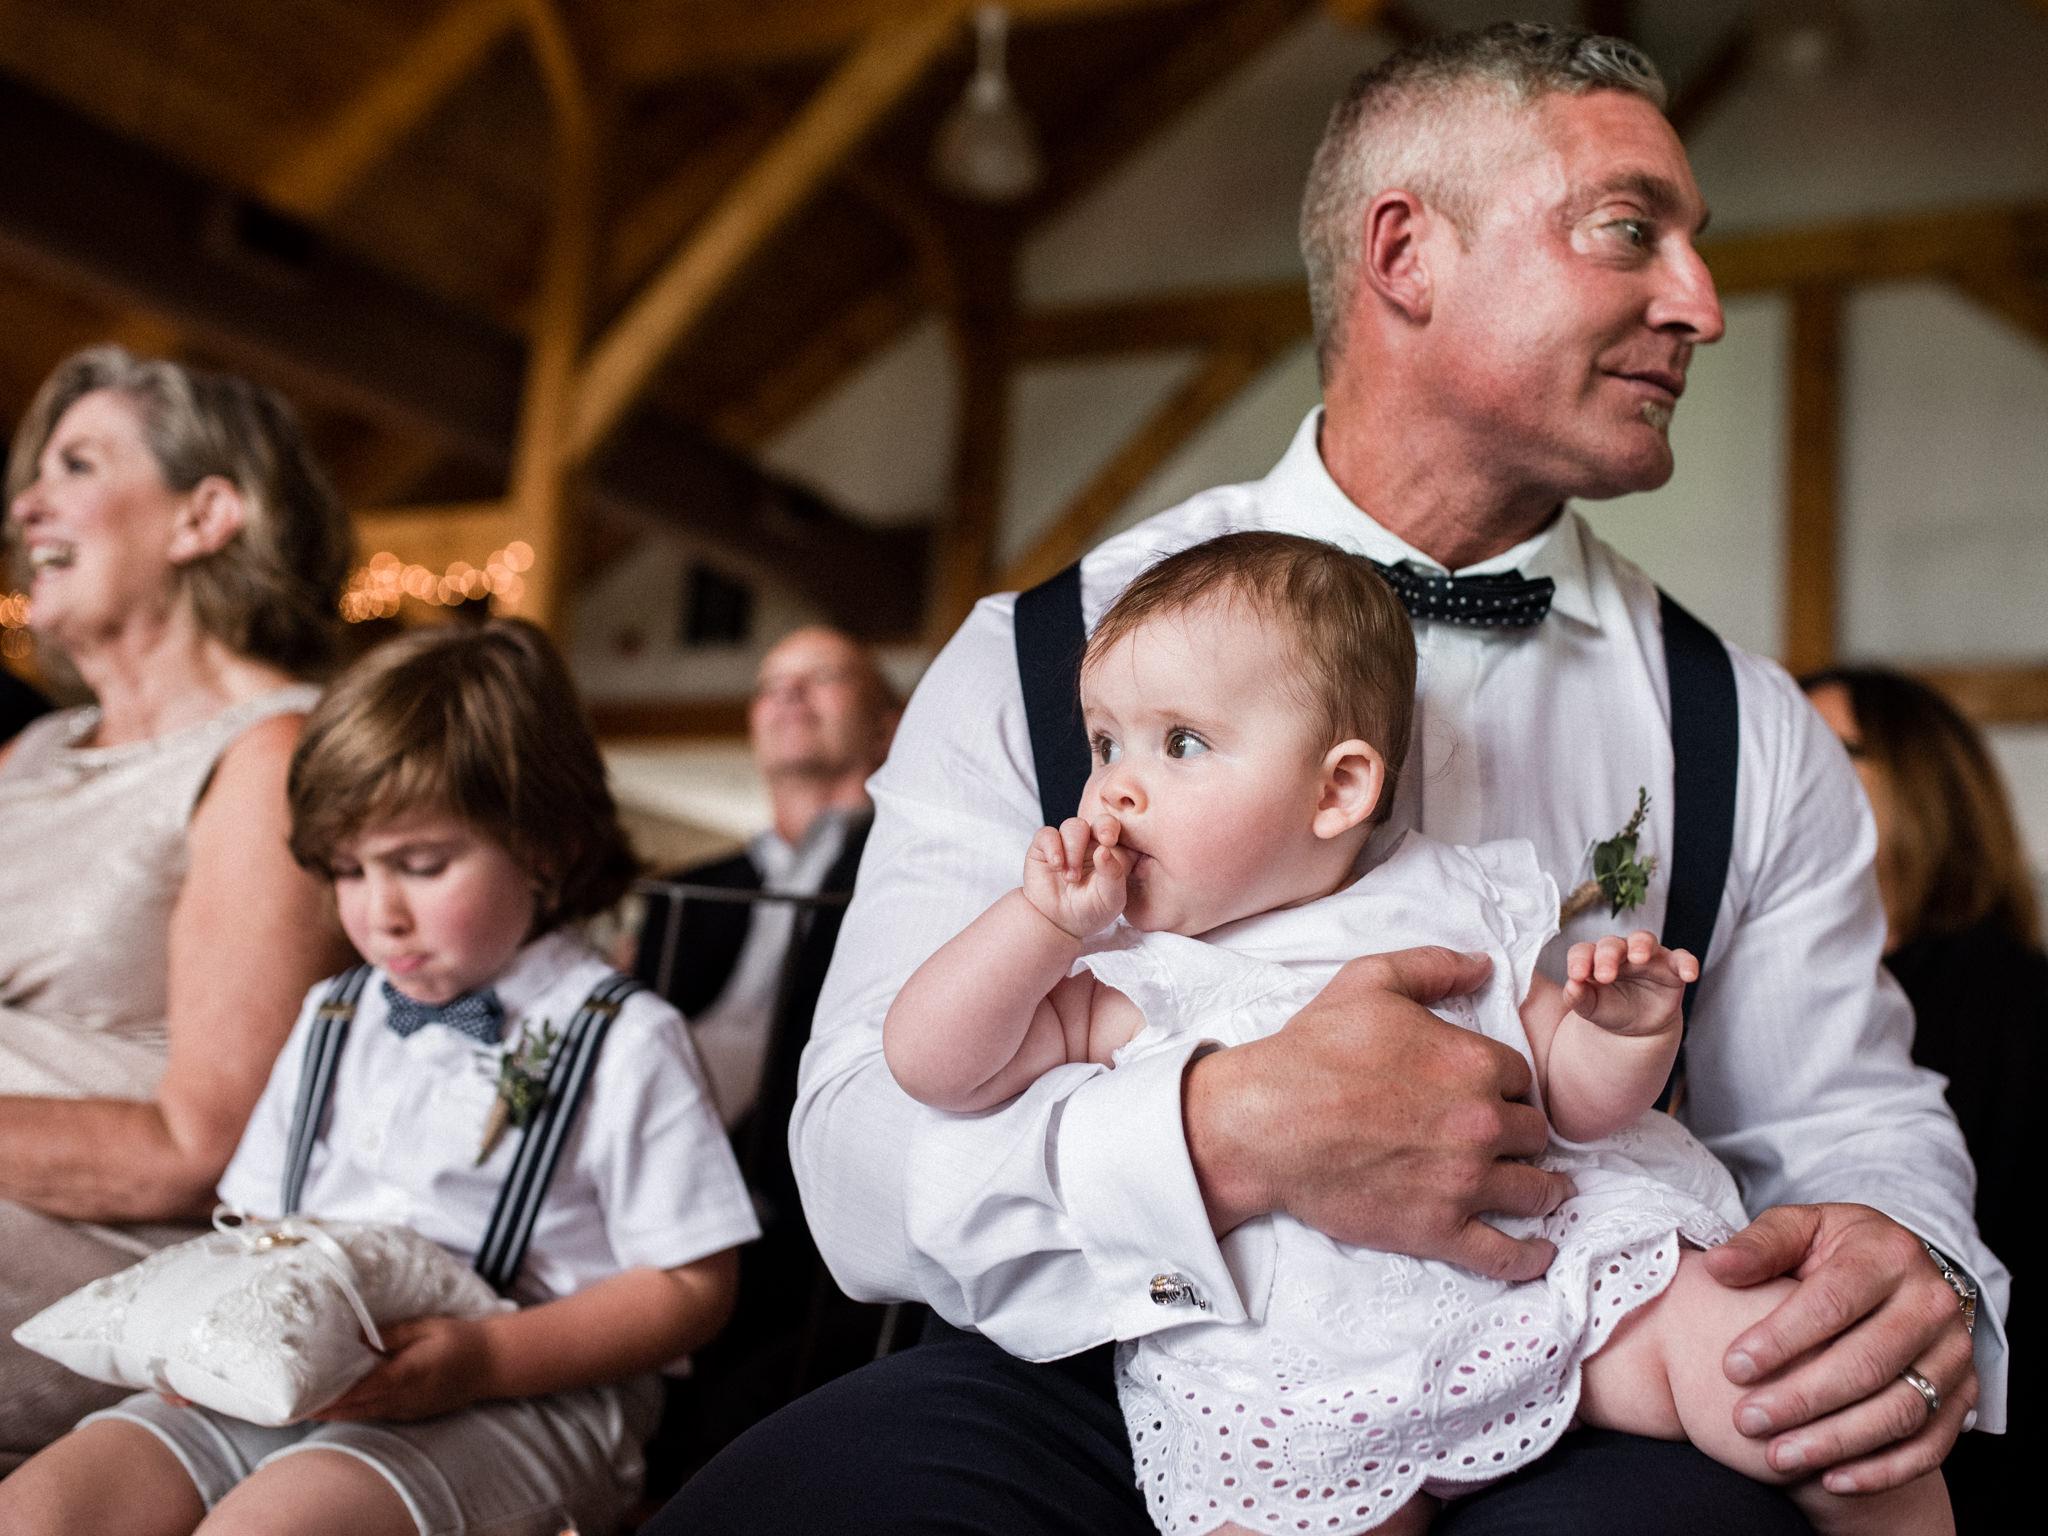 skyloft-wedding-toronto-wedding-photographer-33.jpg